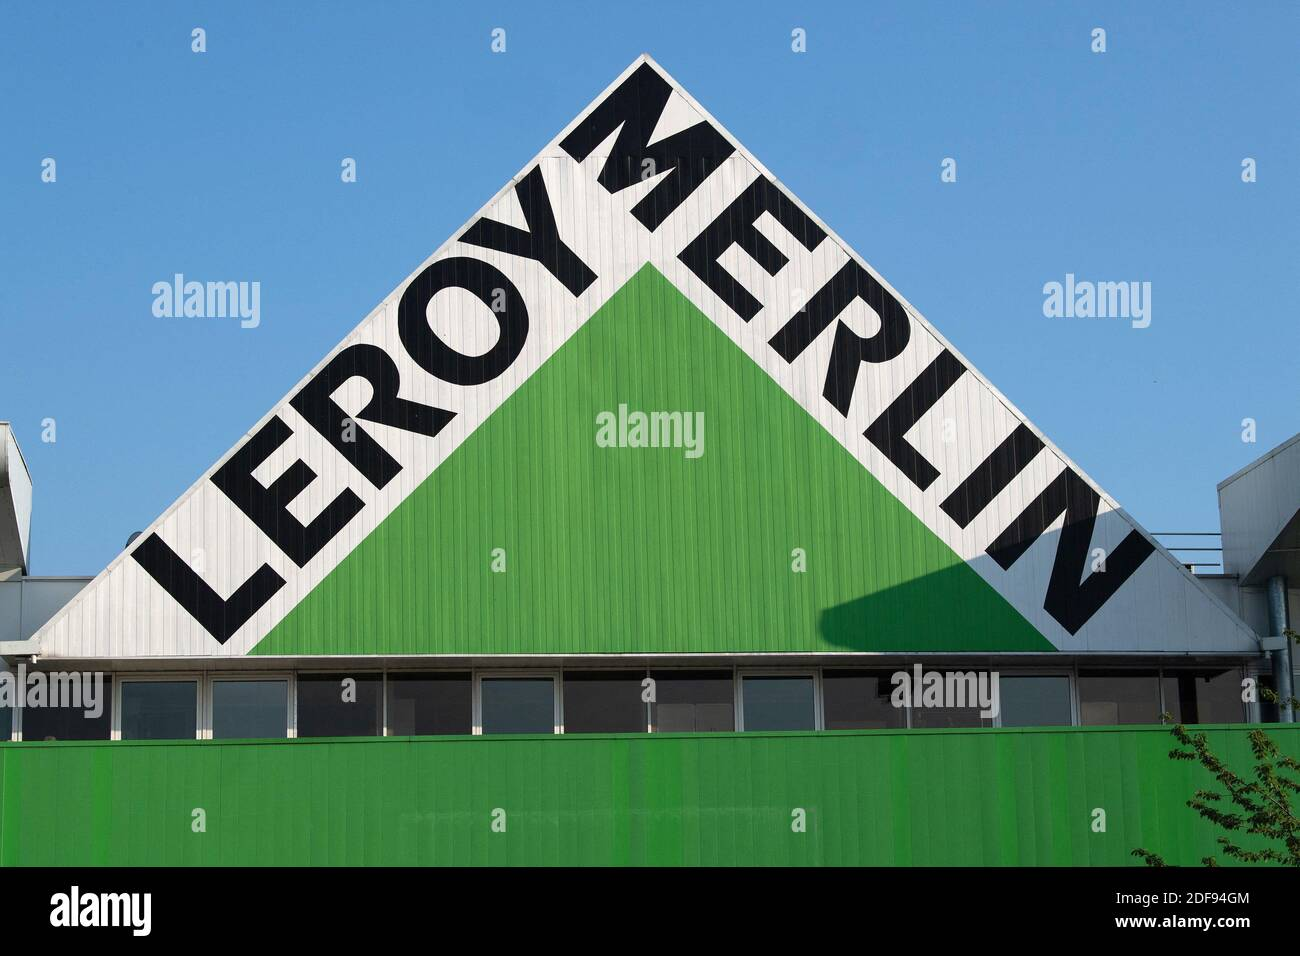 https www alamy com a shop sign of leroy merlin in bonneuil sur marne on april 10 2020 francephoto by david niviereabacapresscom image388049108 html